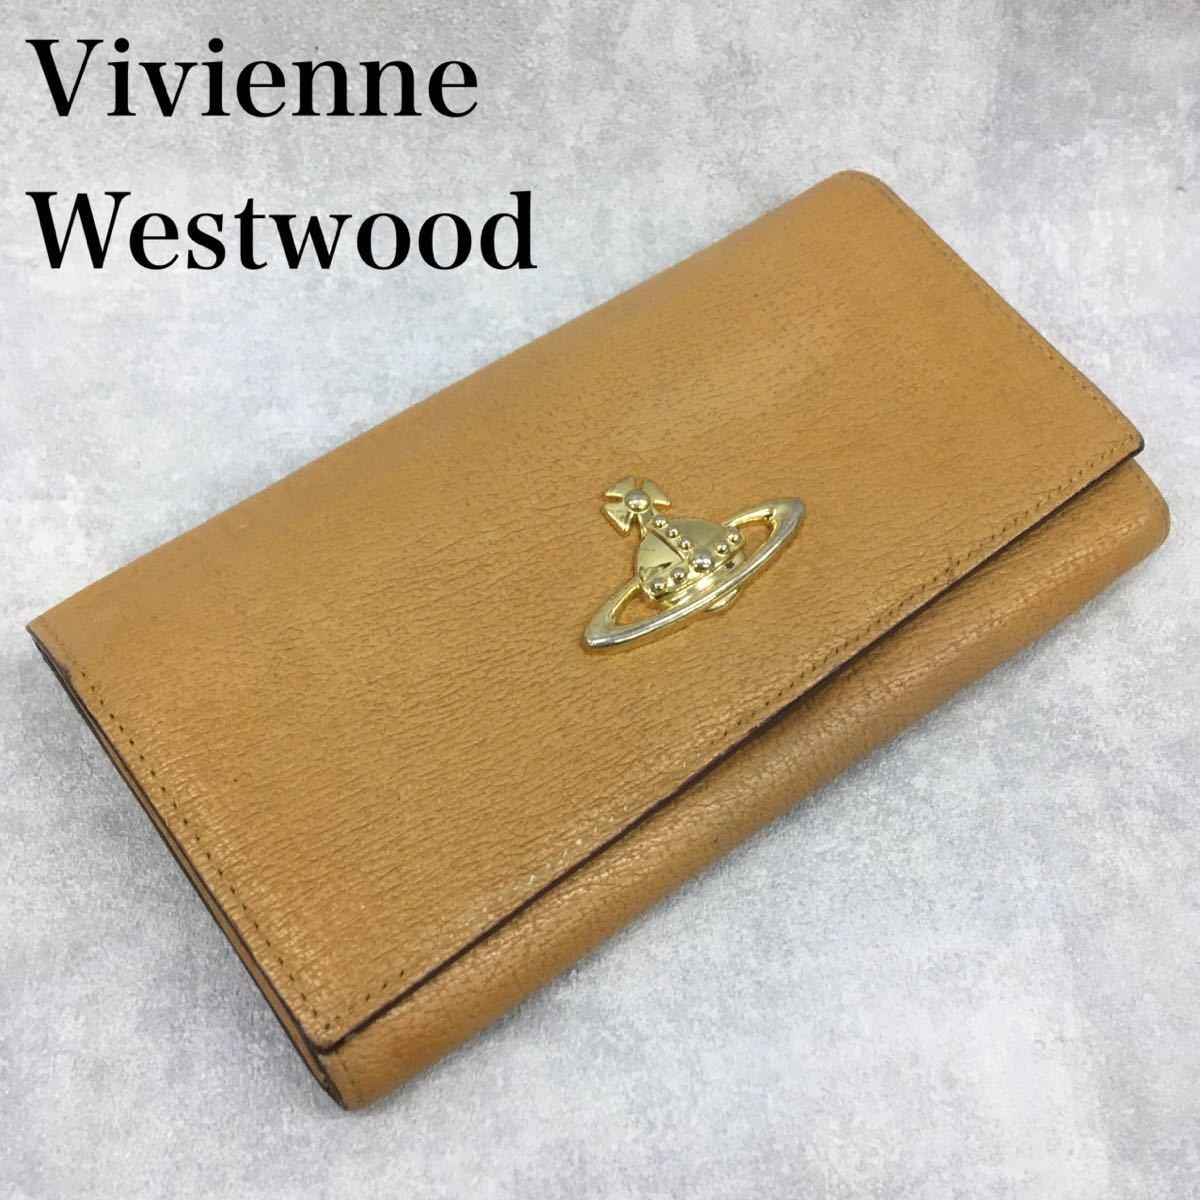 Vivienne Westwood ヴィヴィアンウエストウッド 本革長財布 オーブロゴ 裏地総柄 キャメルブラウン